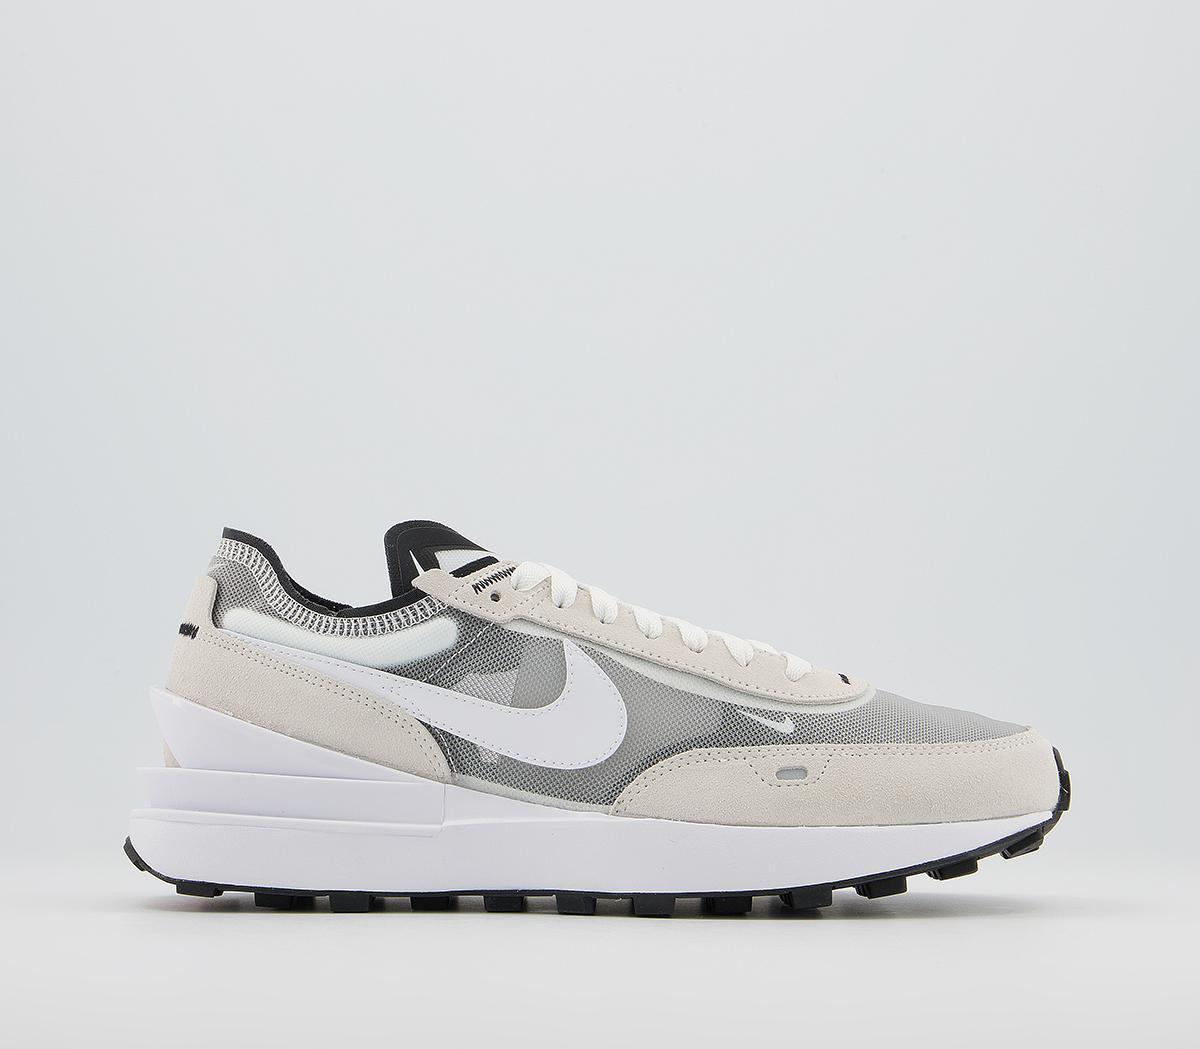 Nike Waffle One Trainers